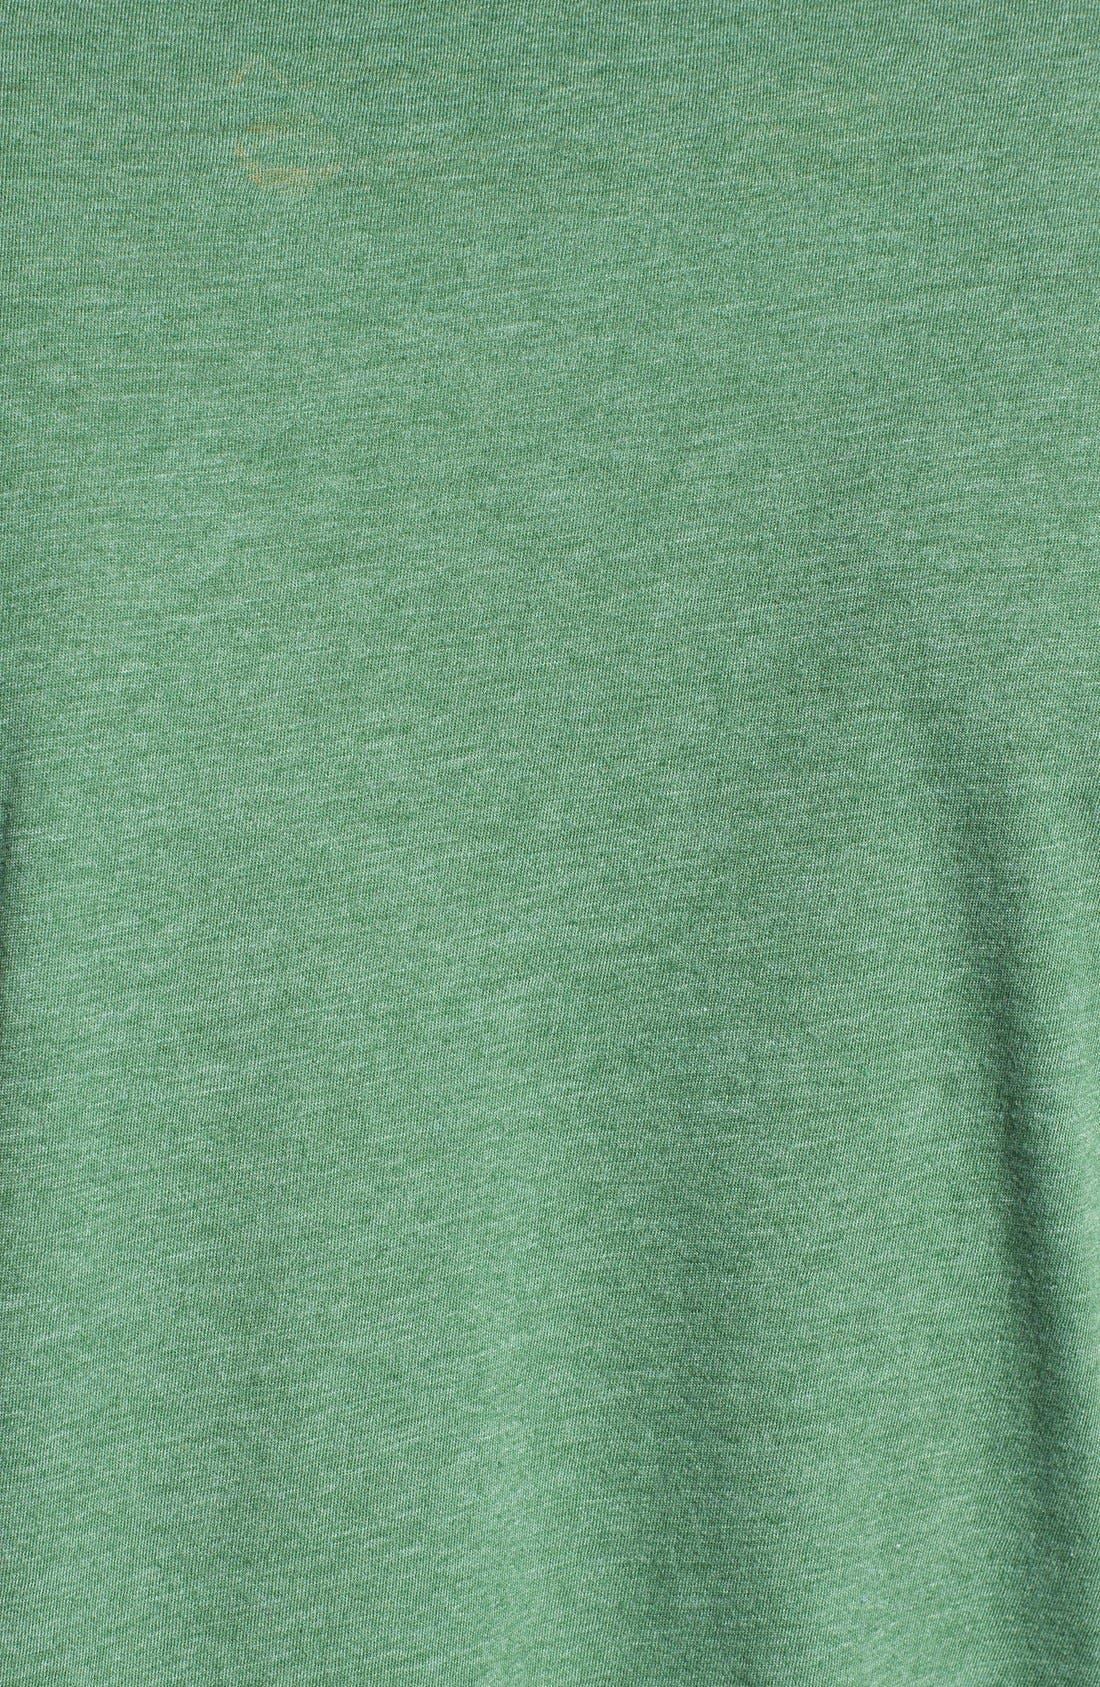 Alternate Image 3  - RVCA 'Bar Hex' Graphic T-Shirt